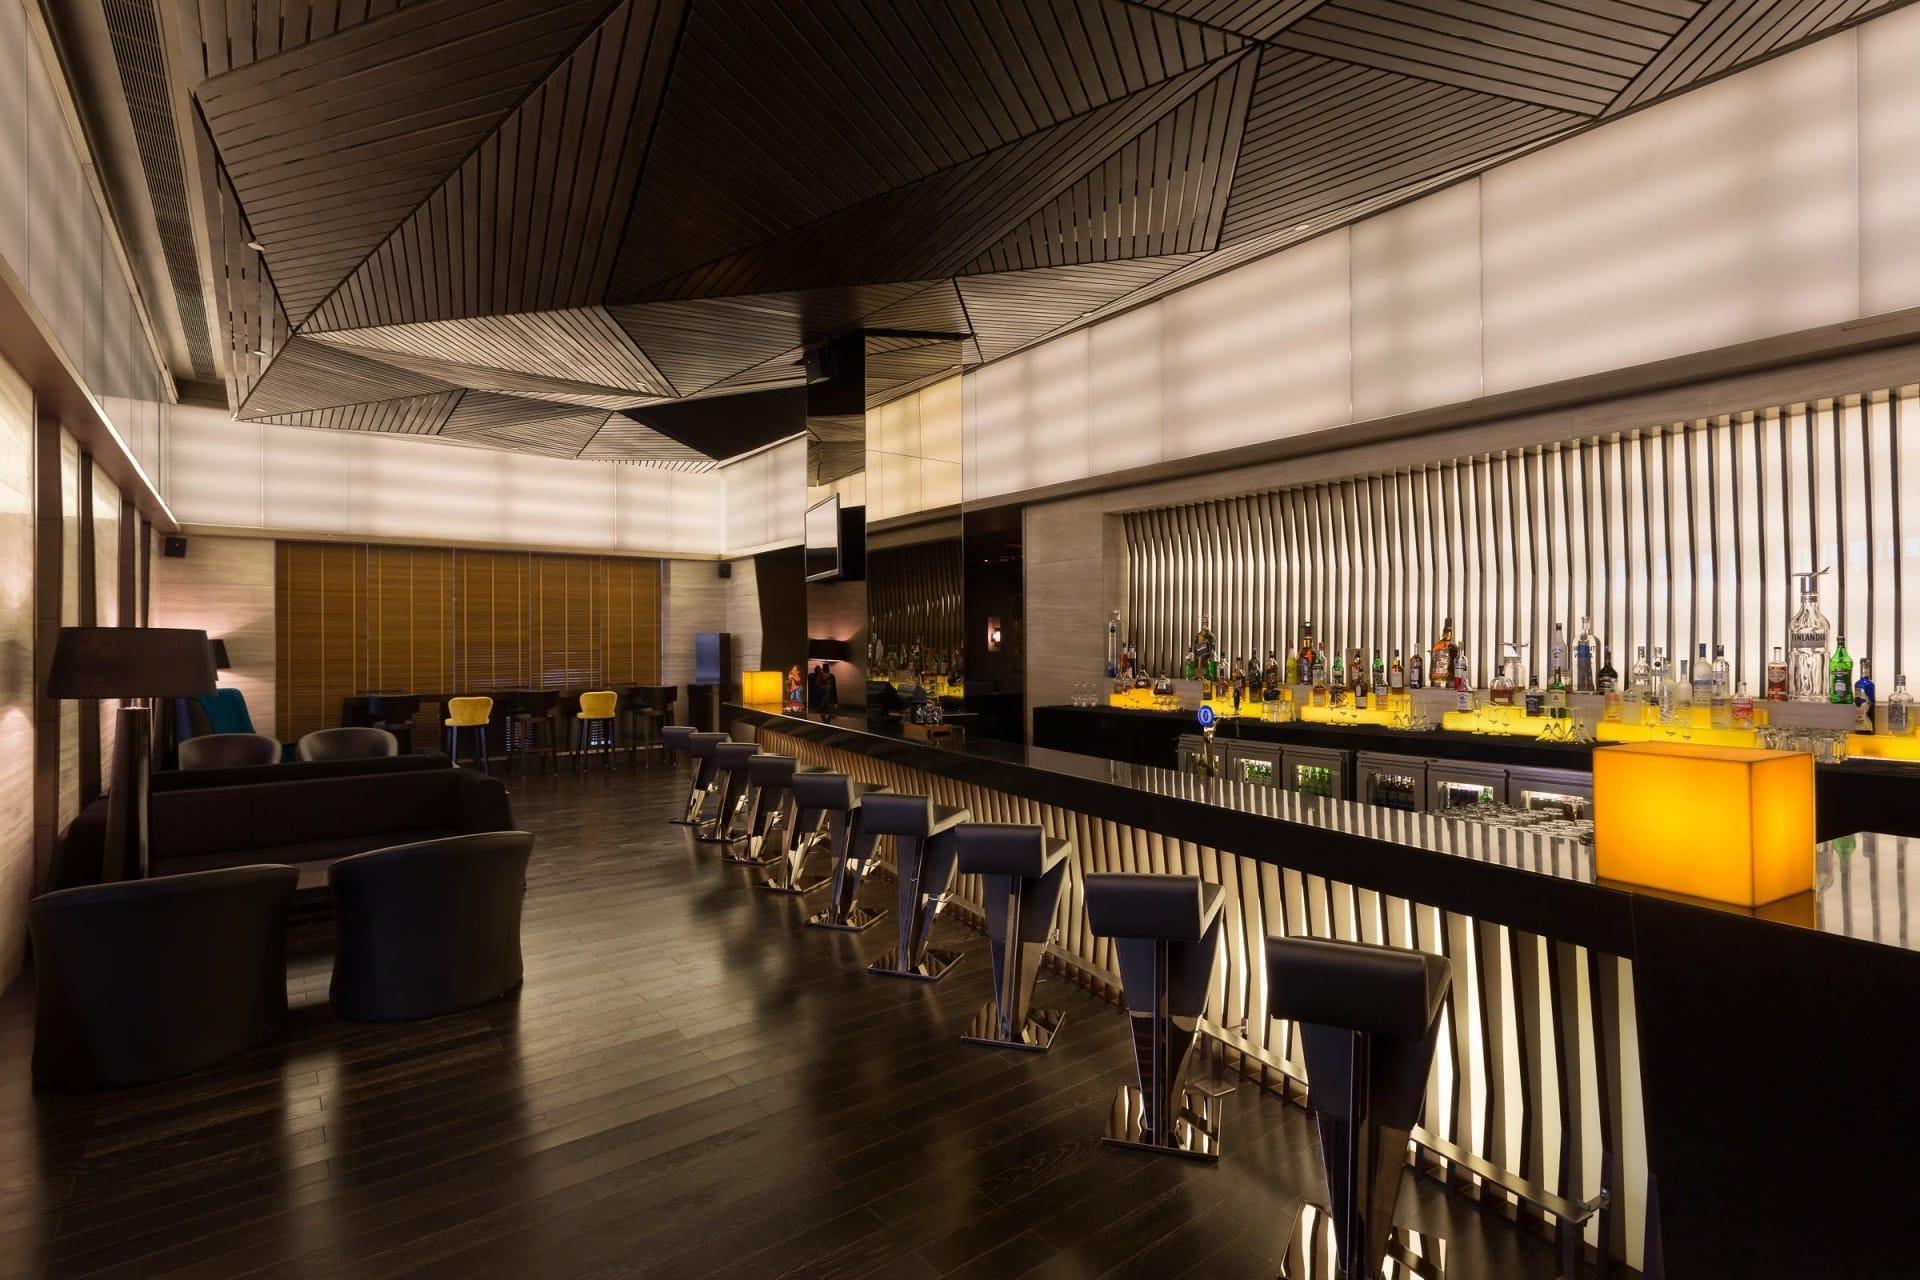 Best Architecture Photographer India   Holiday Inn Restaurant Bar Photography